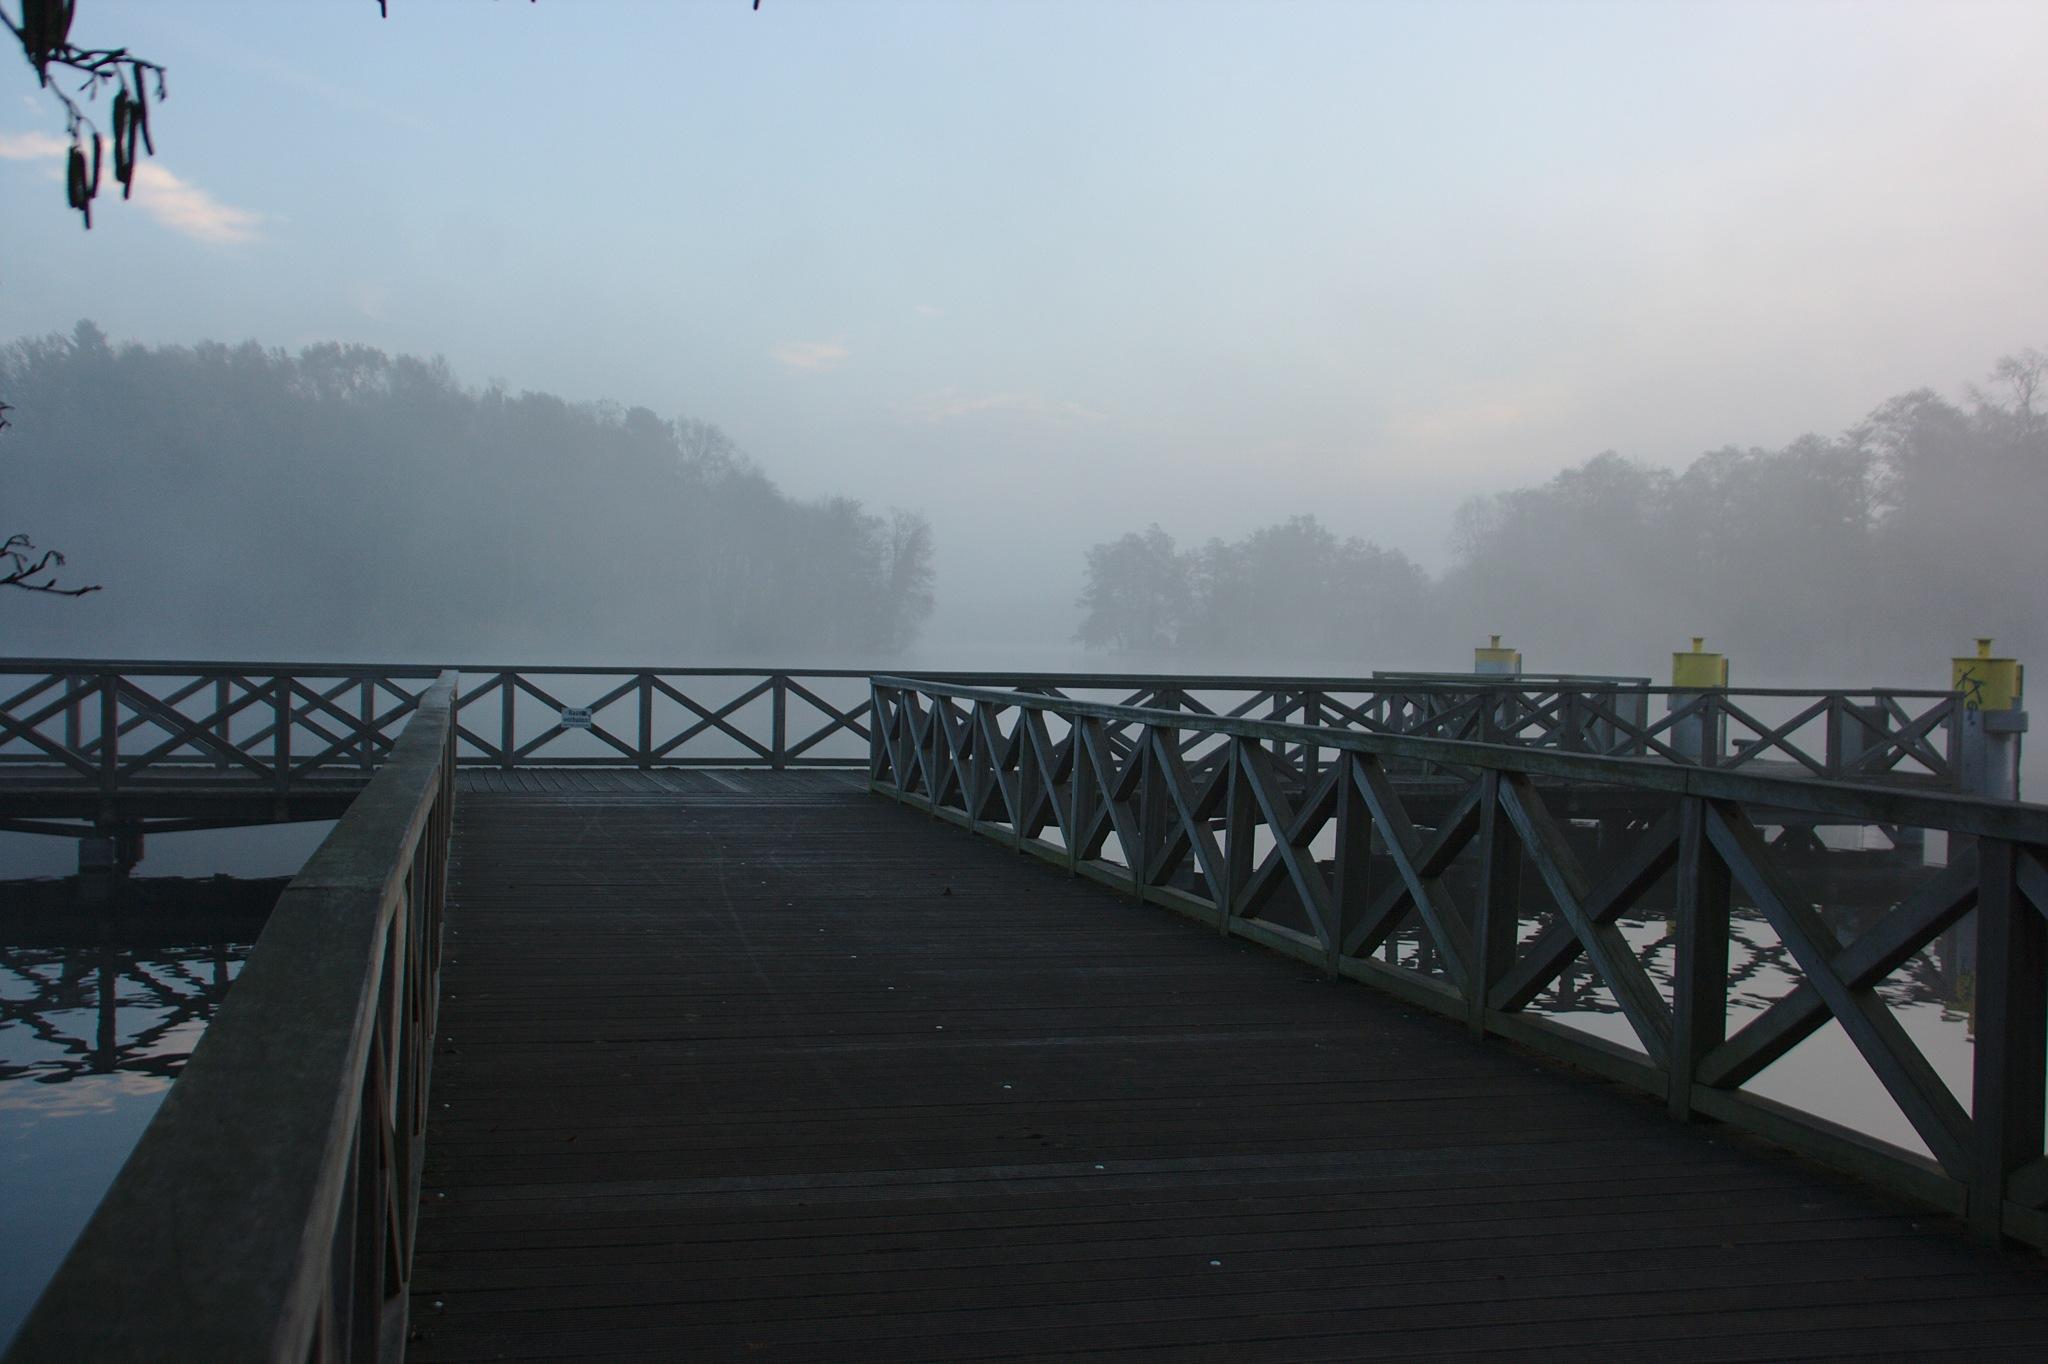 Foggy morning mood by Minzbart_Knipserei